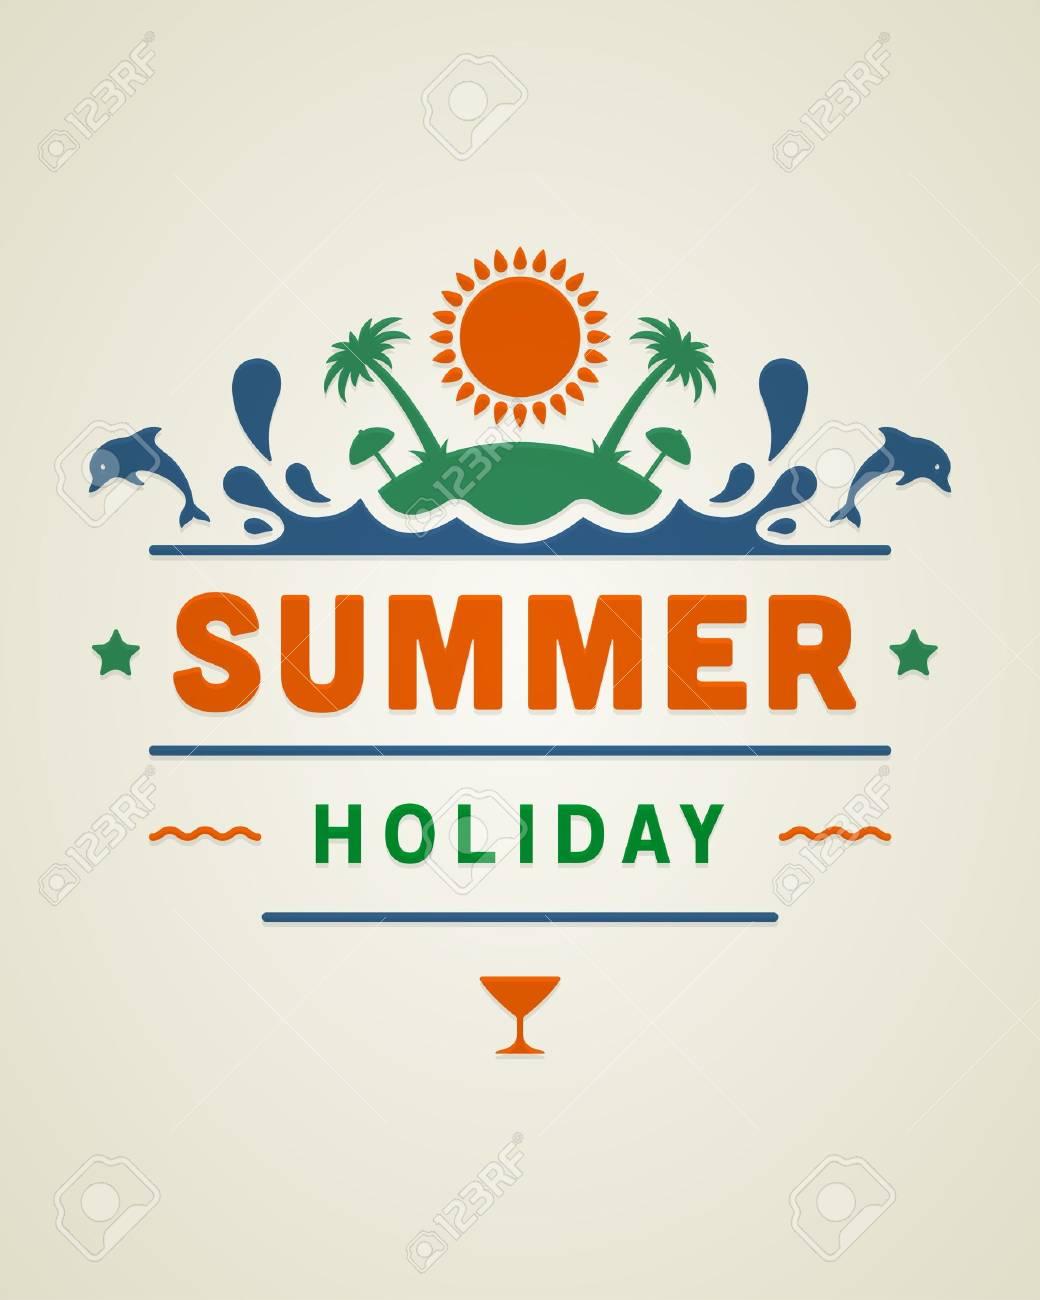 Poster design vector graphics - Retro Summer Design Poster Vector Illustration Stock Vector 19799794